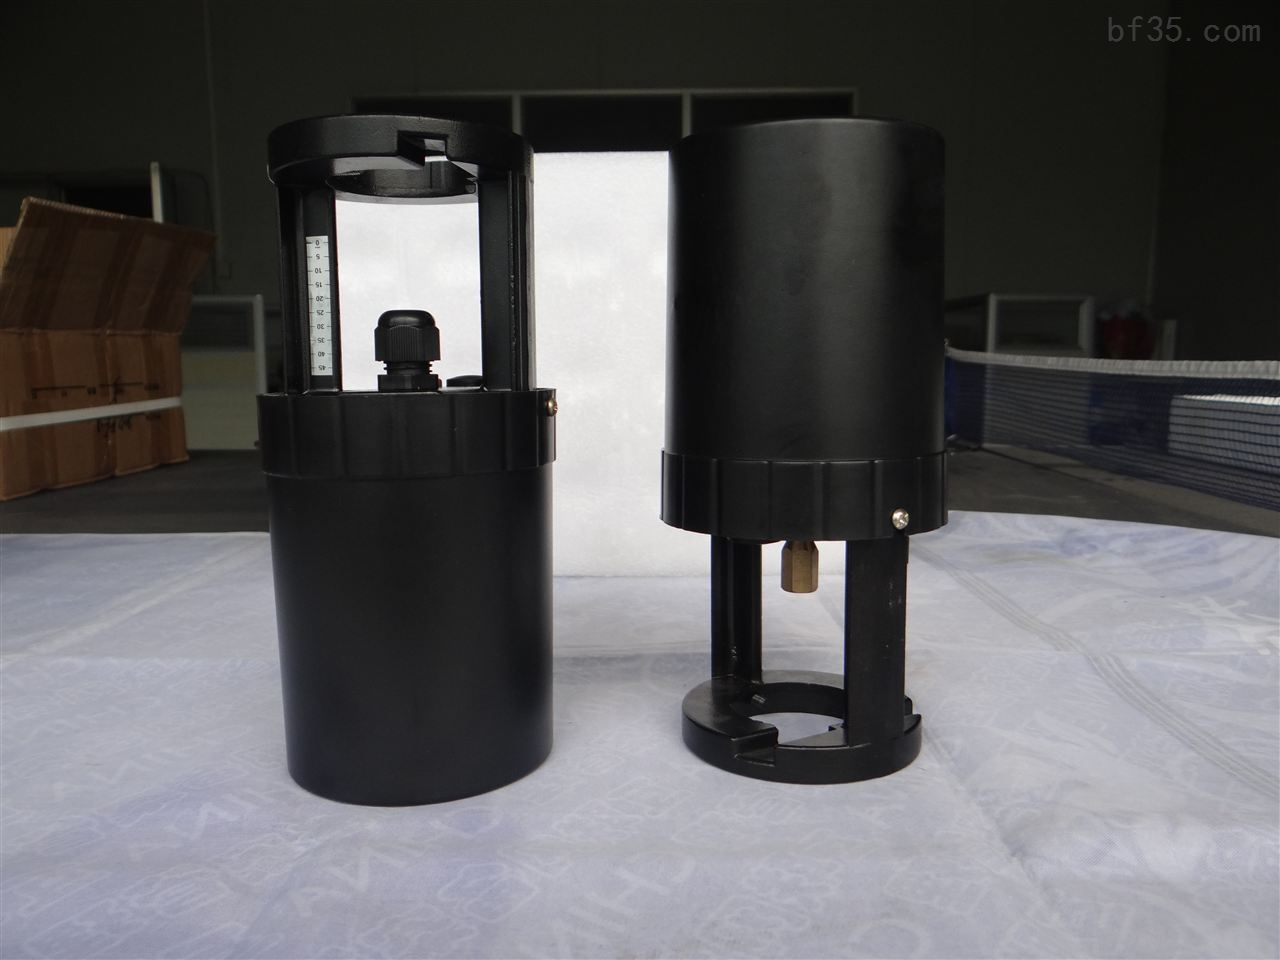 va3200系列电动执行器使用说明书  产品型号: va3200 产品参考价: 341